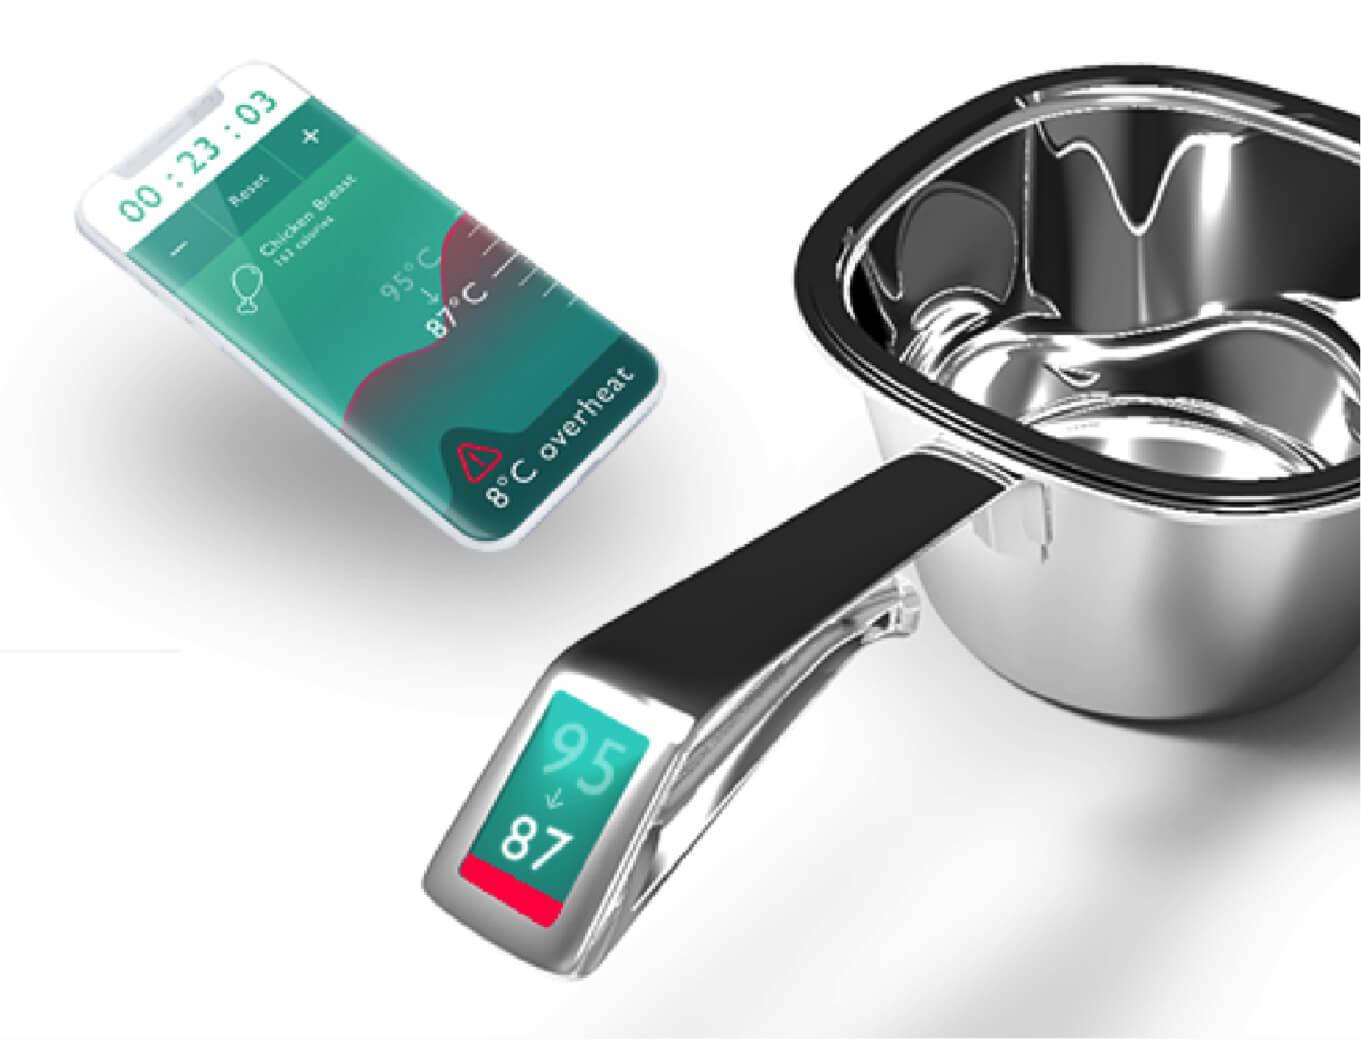 Hancook award winning smart pan connected to mobile